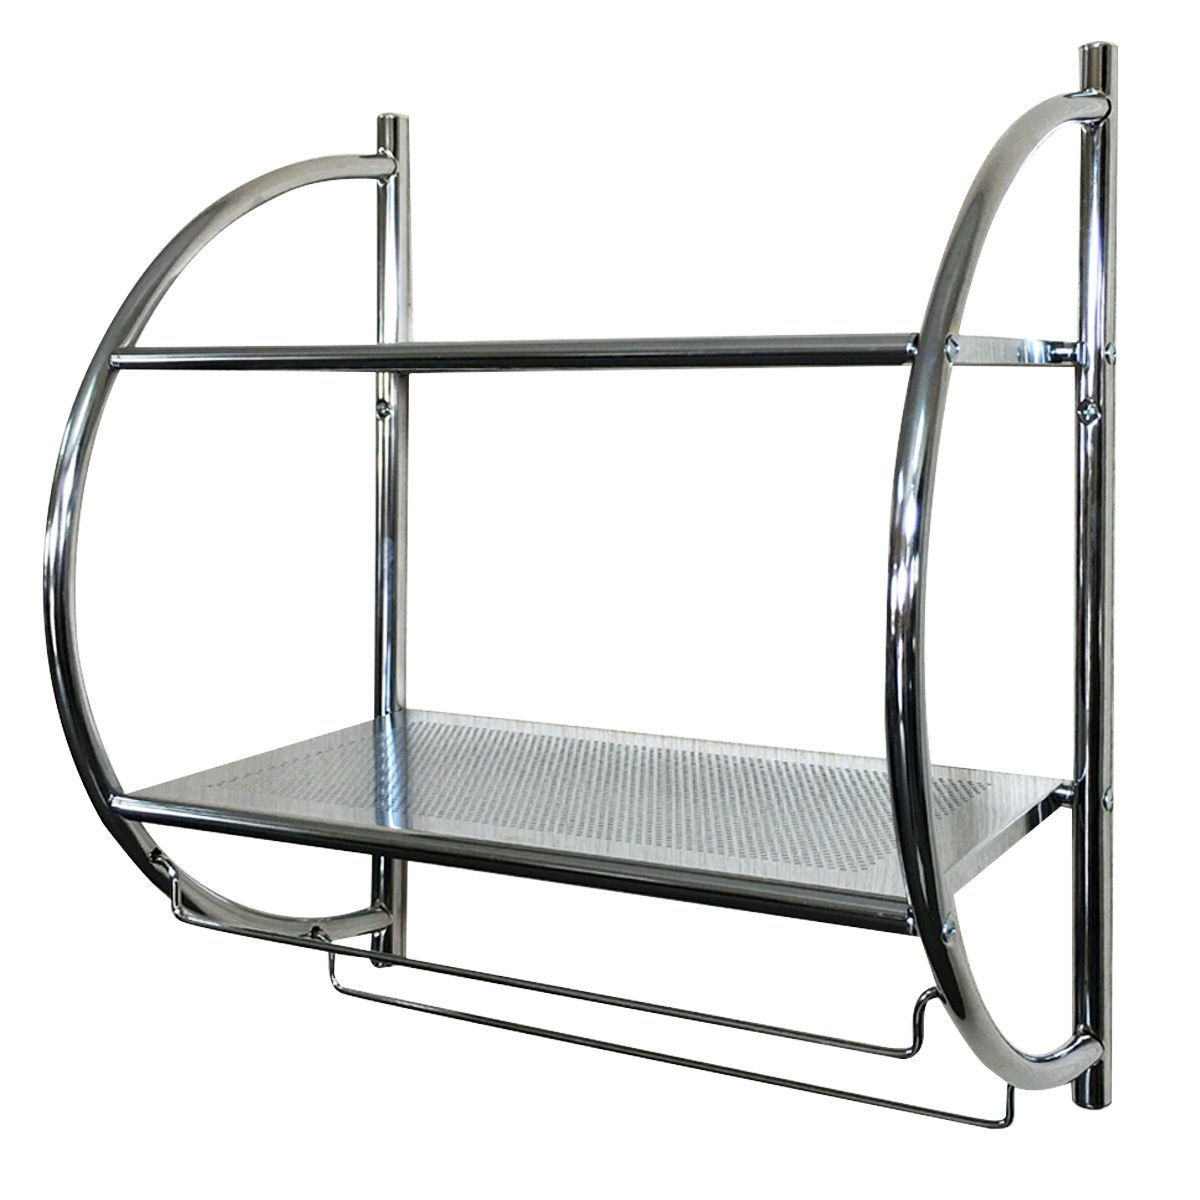 TANGKULA 2-Tier Shelf with Towel Bar Wall Mount Bathroom Toilet Organizer Storage Shelf